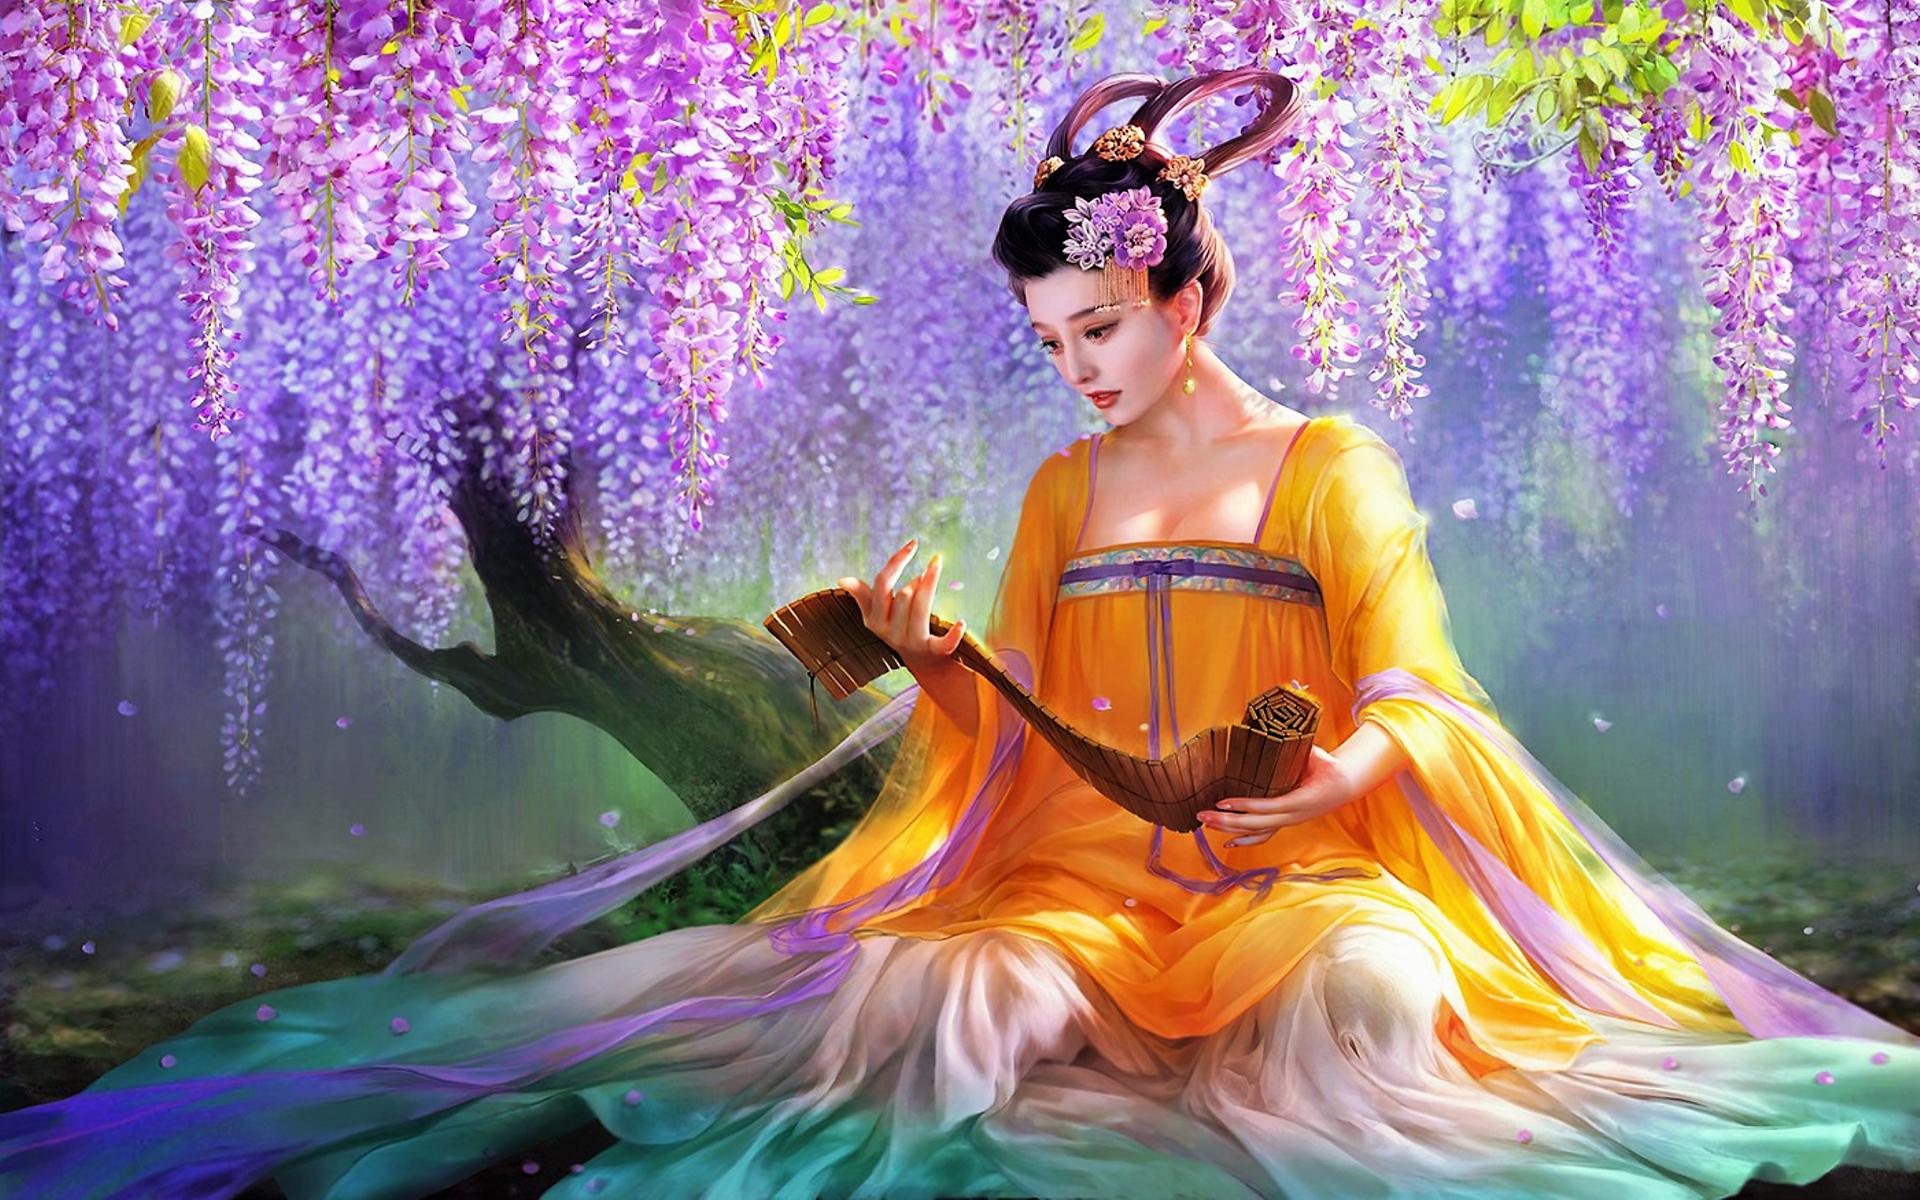 Woman Asian Wisteria 1920x1200